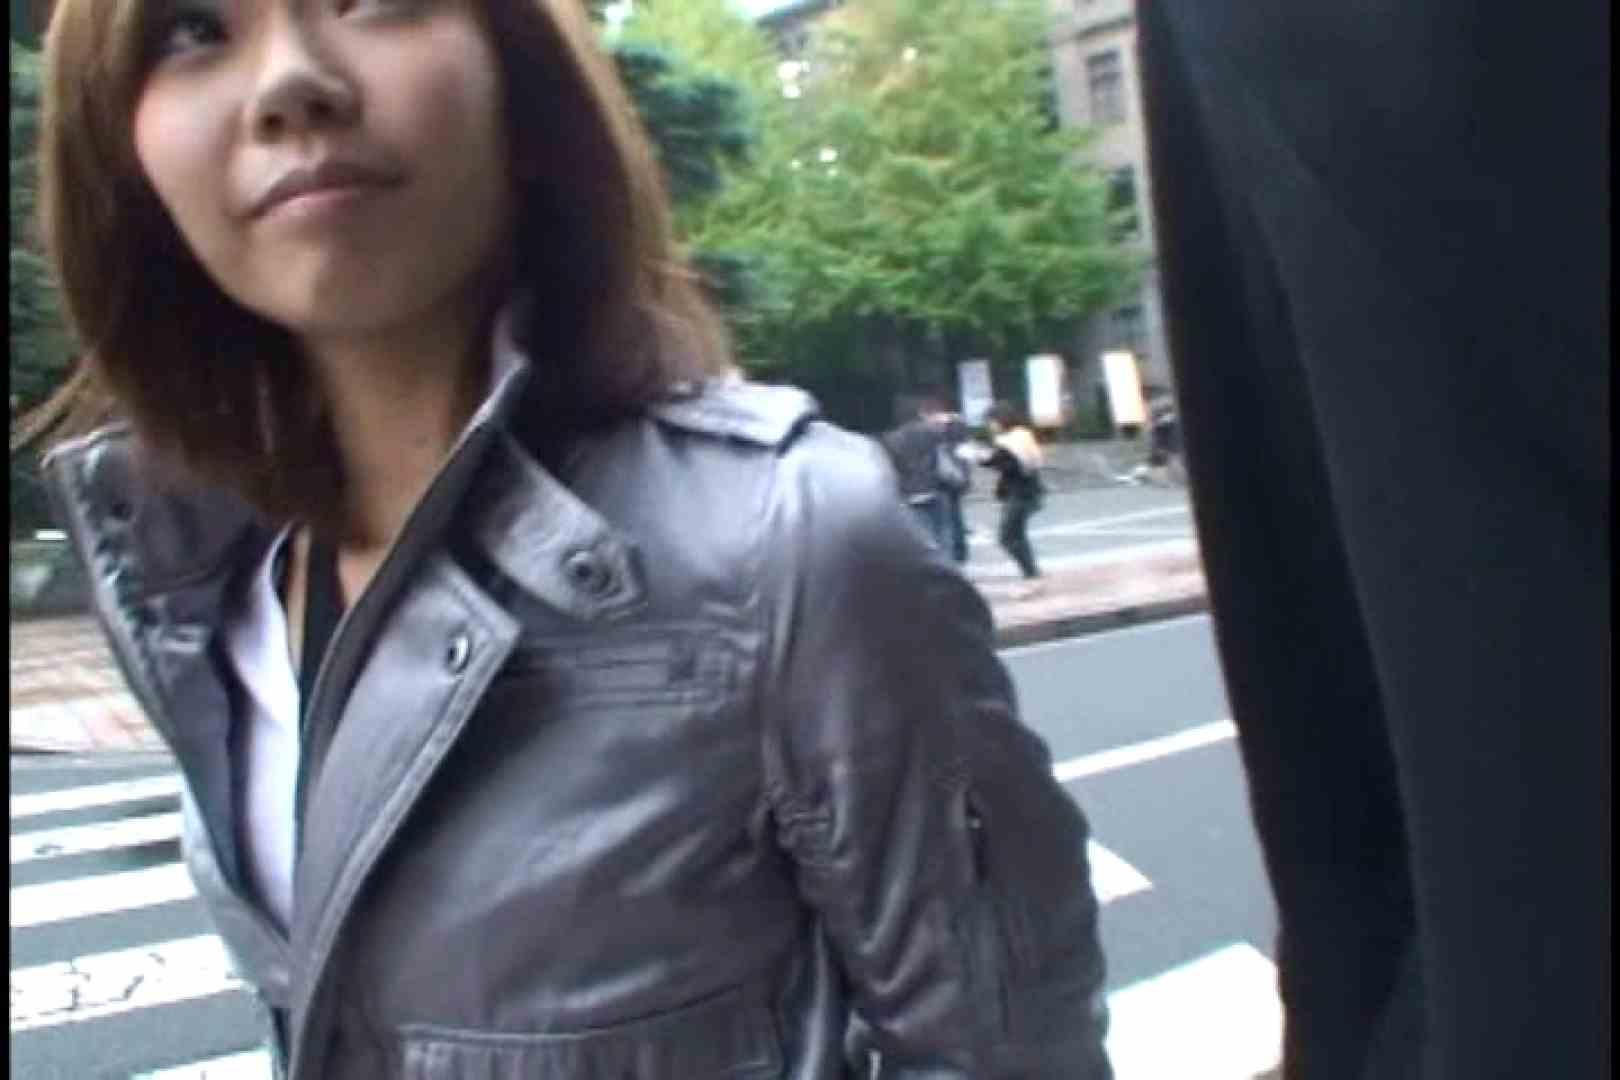 JDハンター全国ツアー vol.036 前編 女子大生のエロ動画  85PIX 26